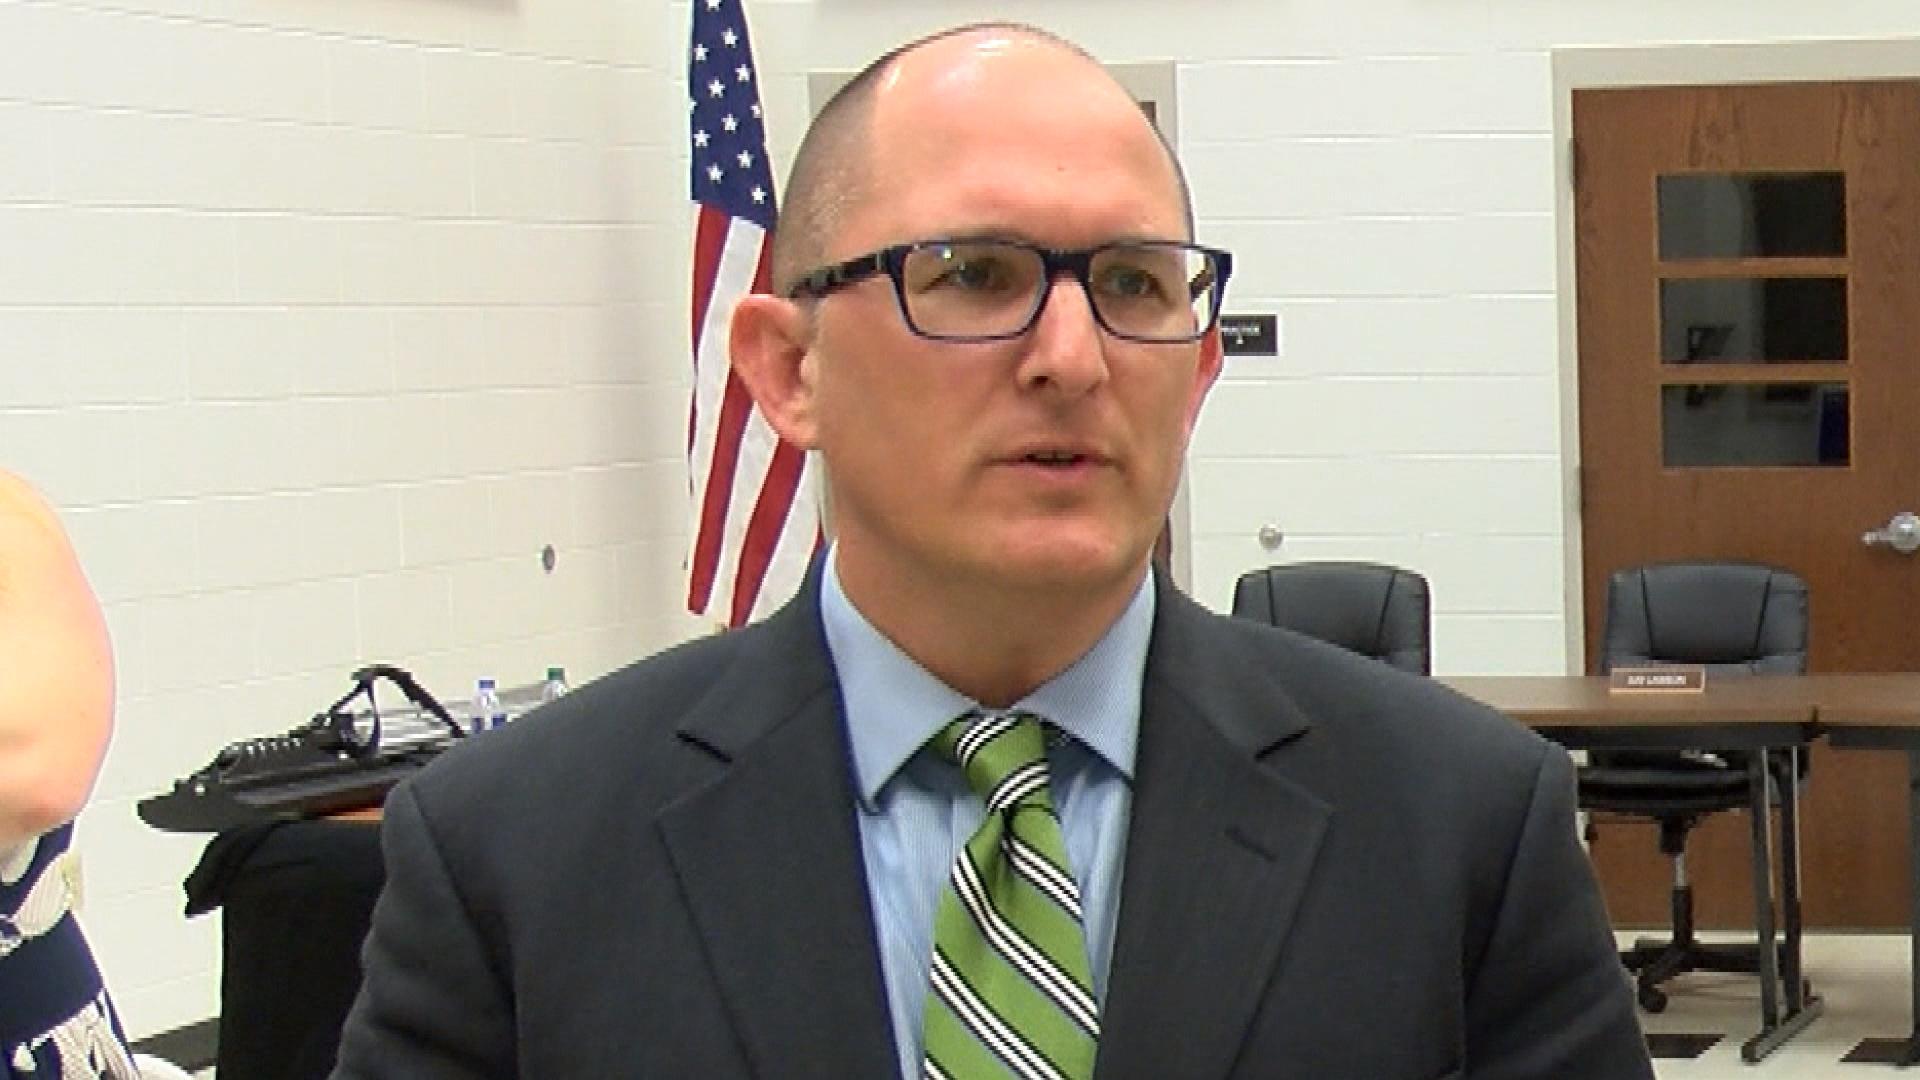 Teacher fired for refusing to use transgender student's pronouns